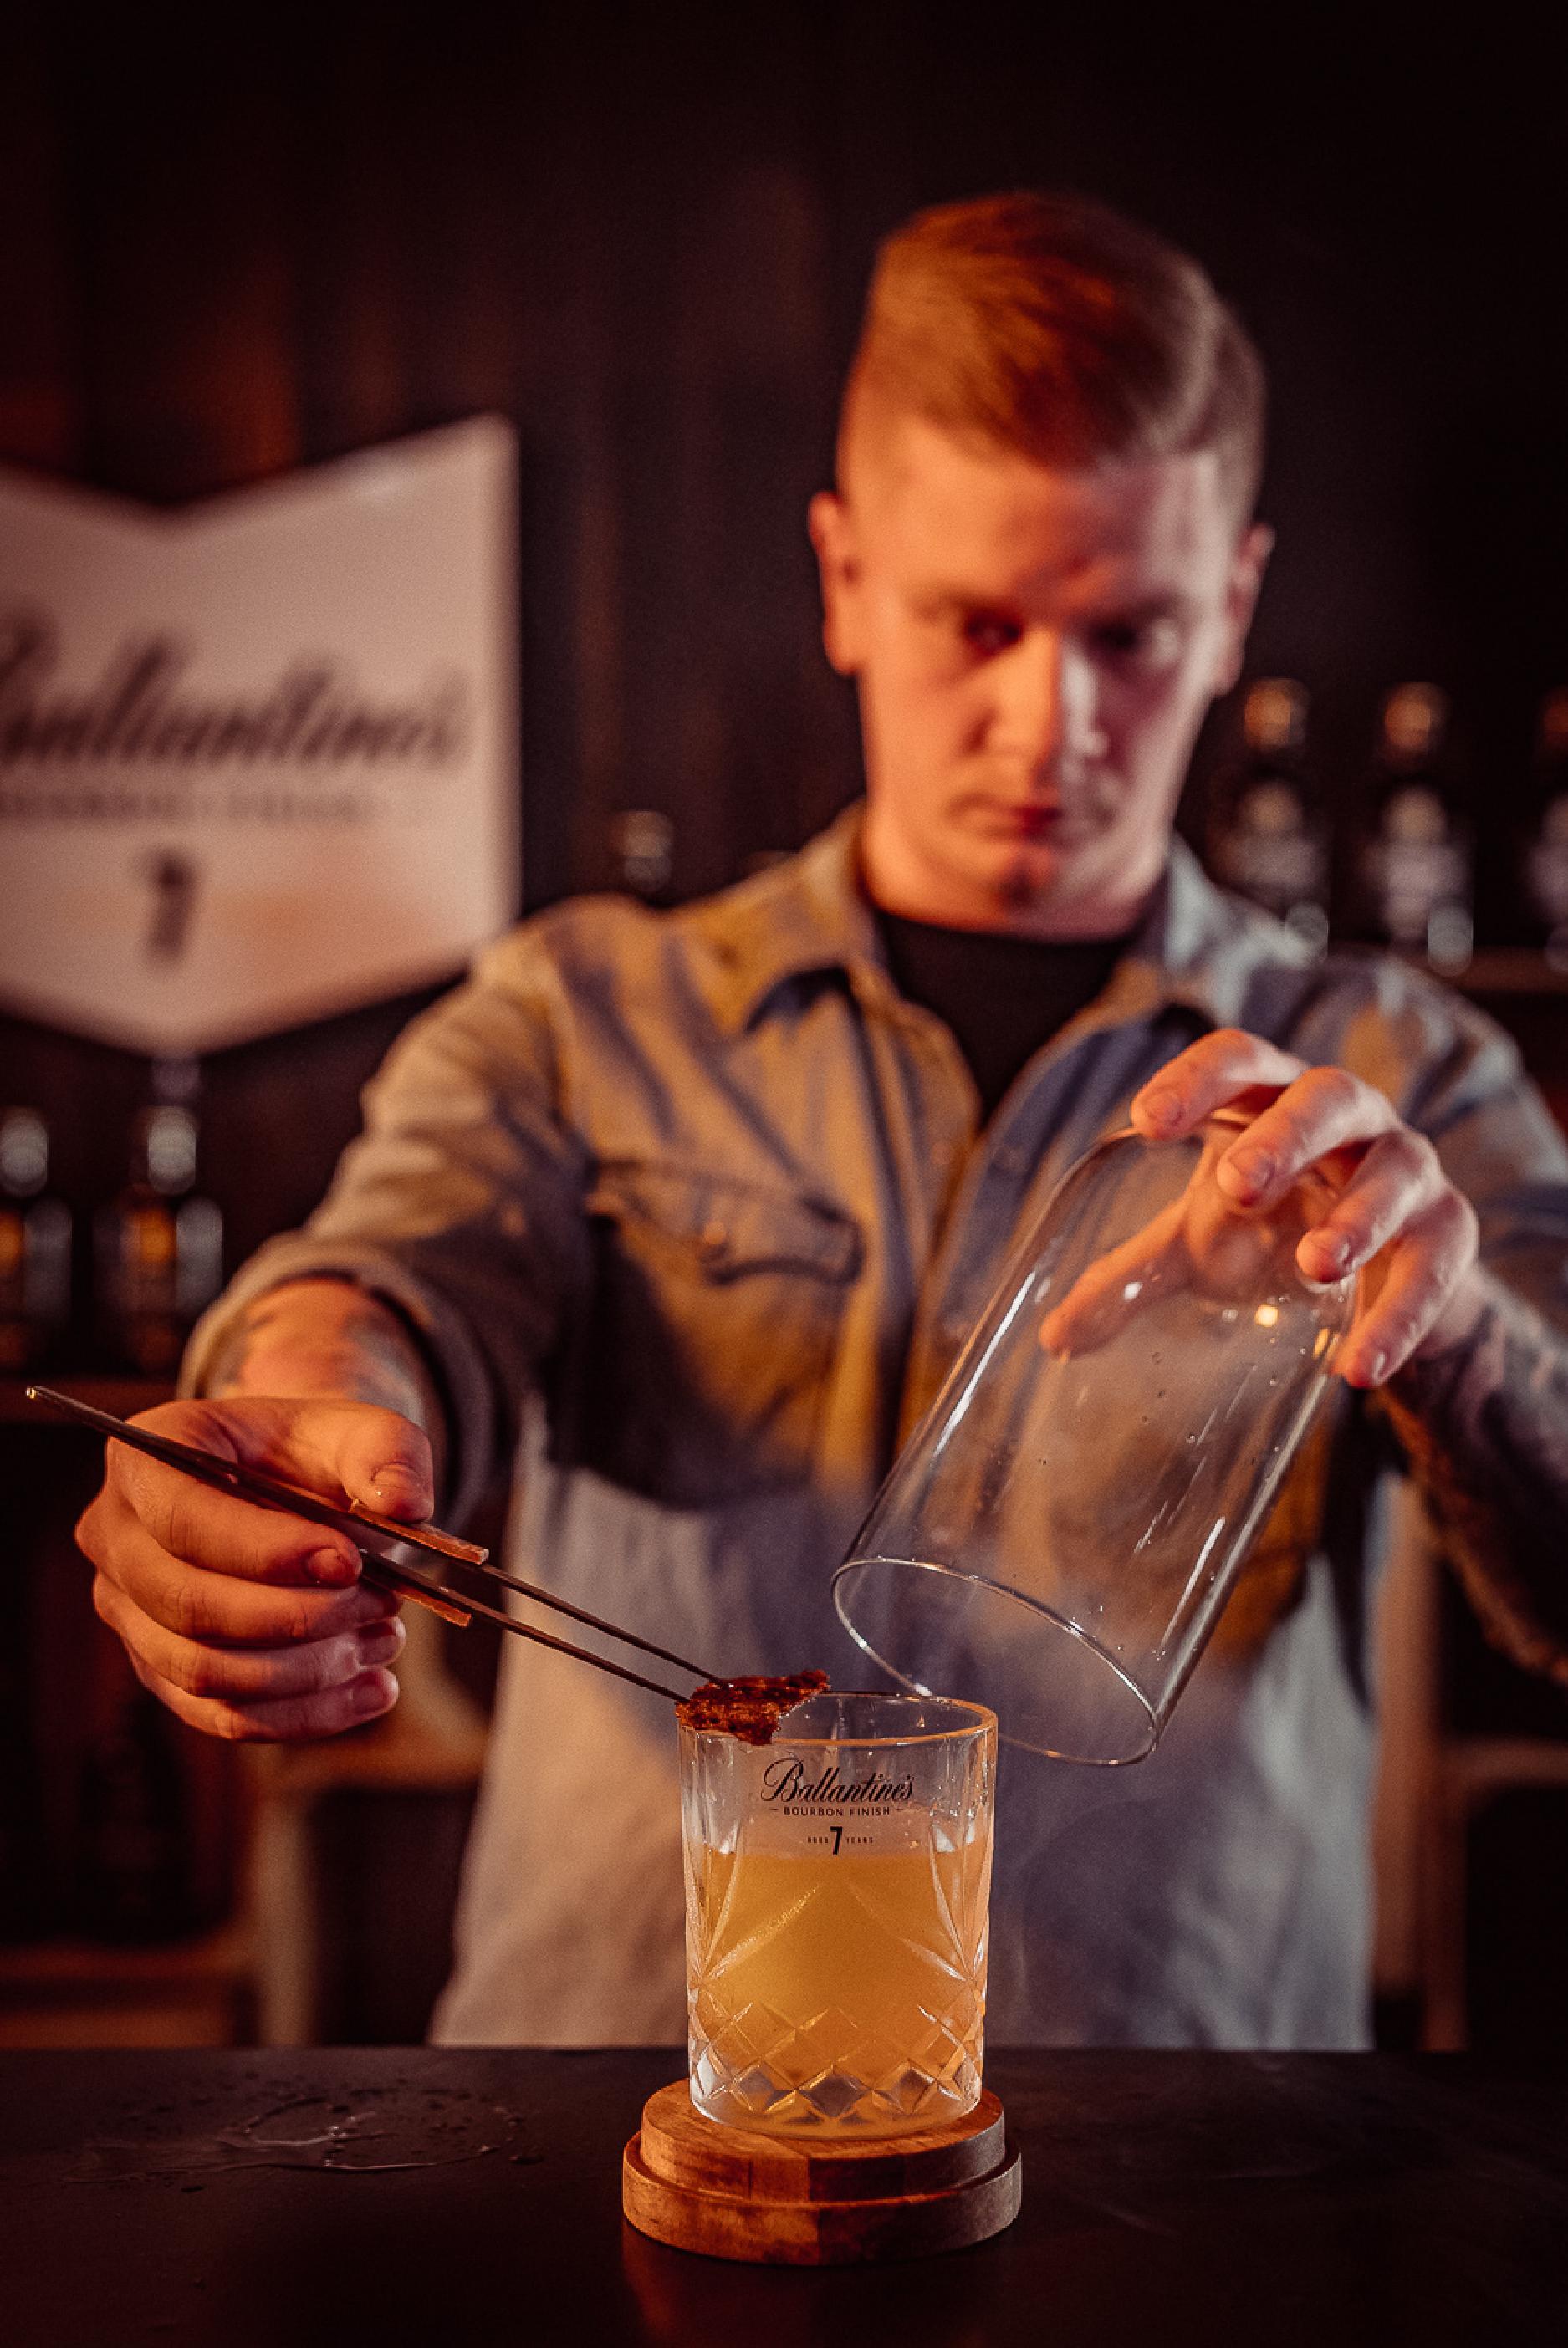 Jurek old fashioned koktajl drink